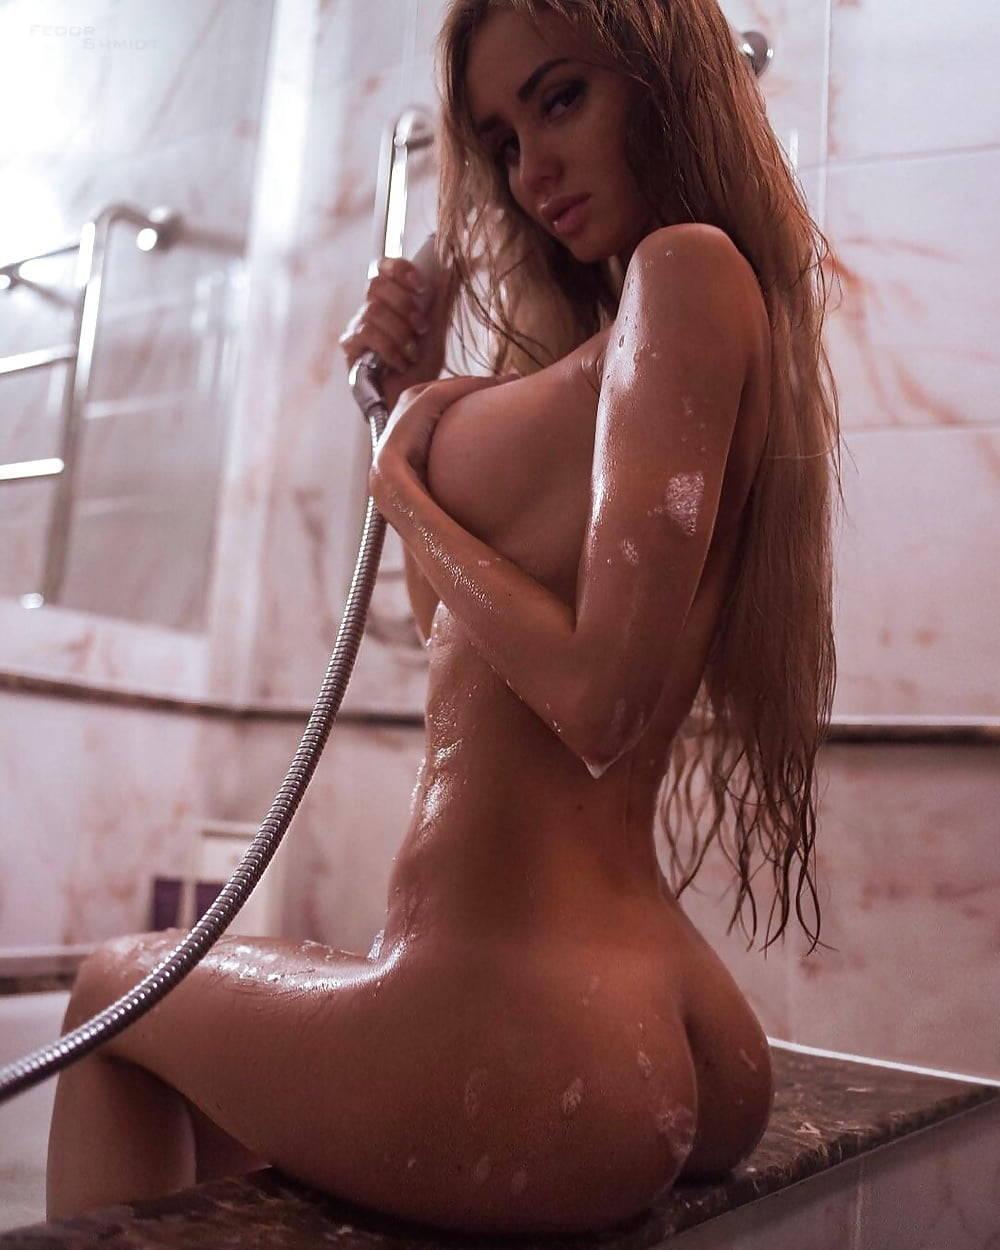 Nude valentina grishko images.dujour.com: over